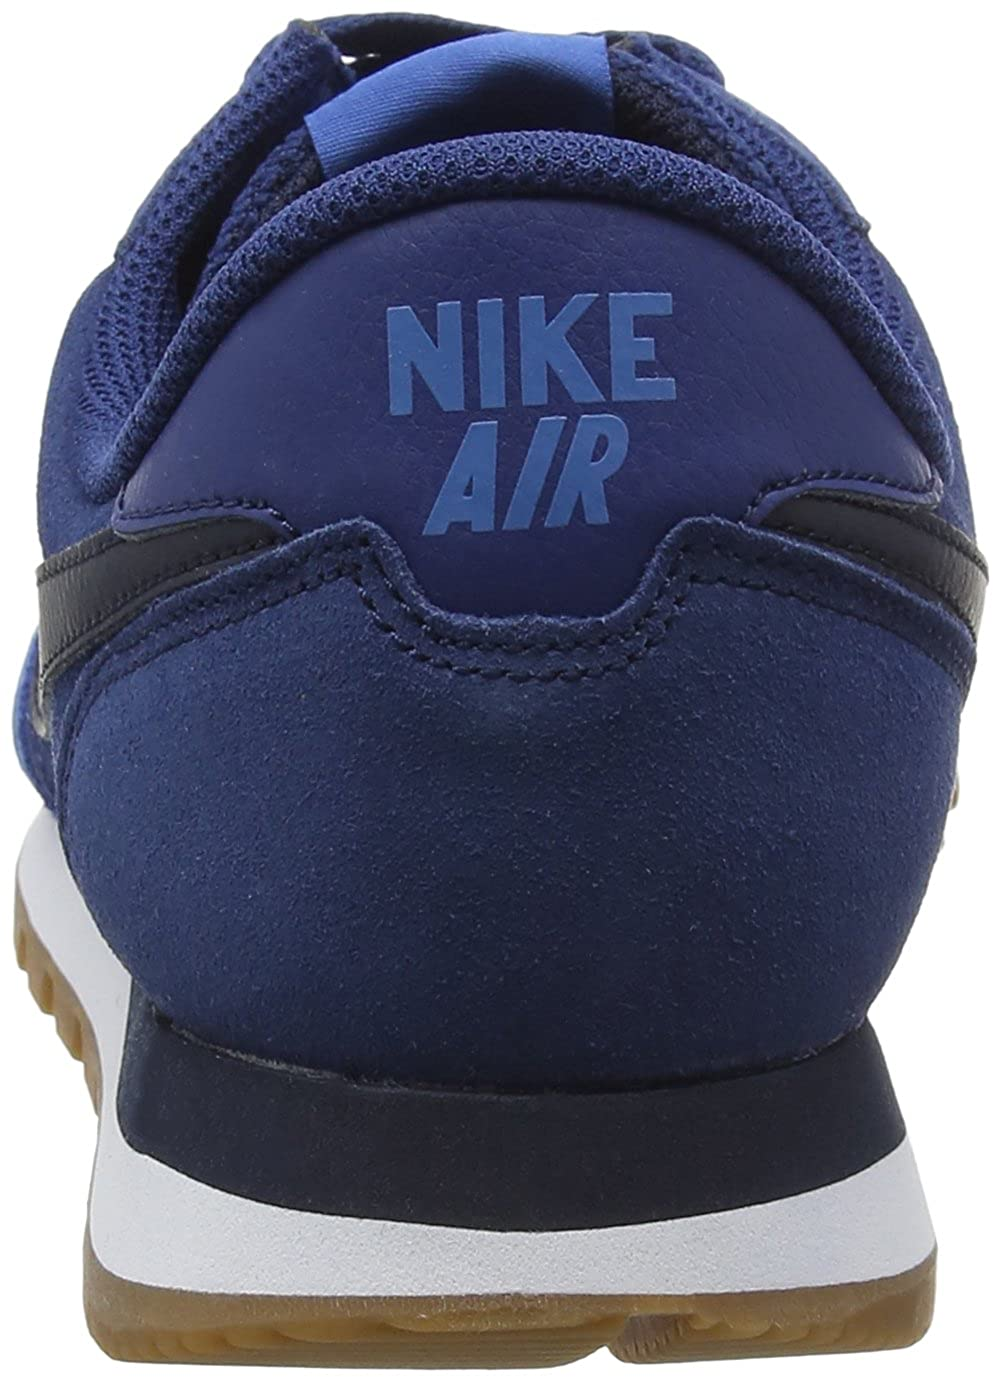 Nike Air Pegasus 83 LTR Herren Turnschuhe  40 EU EU EU 8fa9da